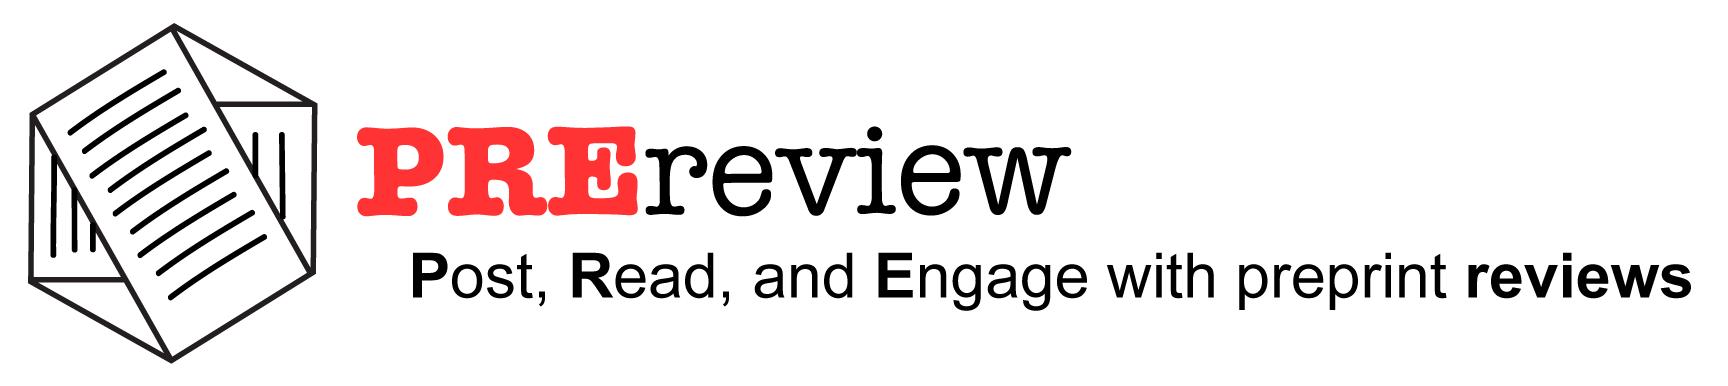 PREreview logo